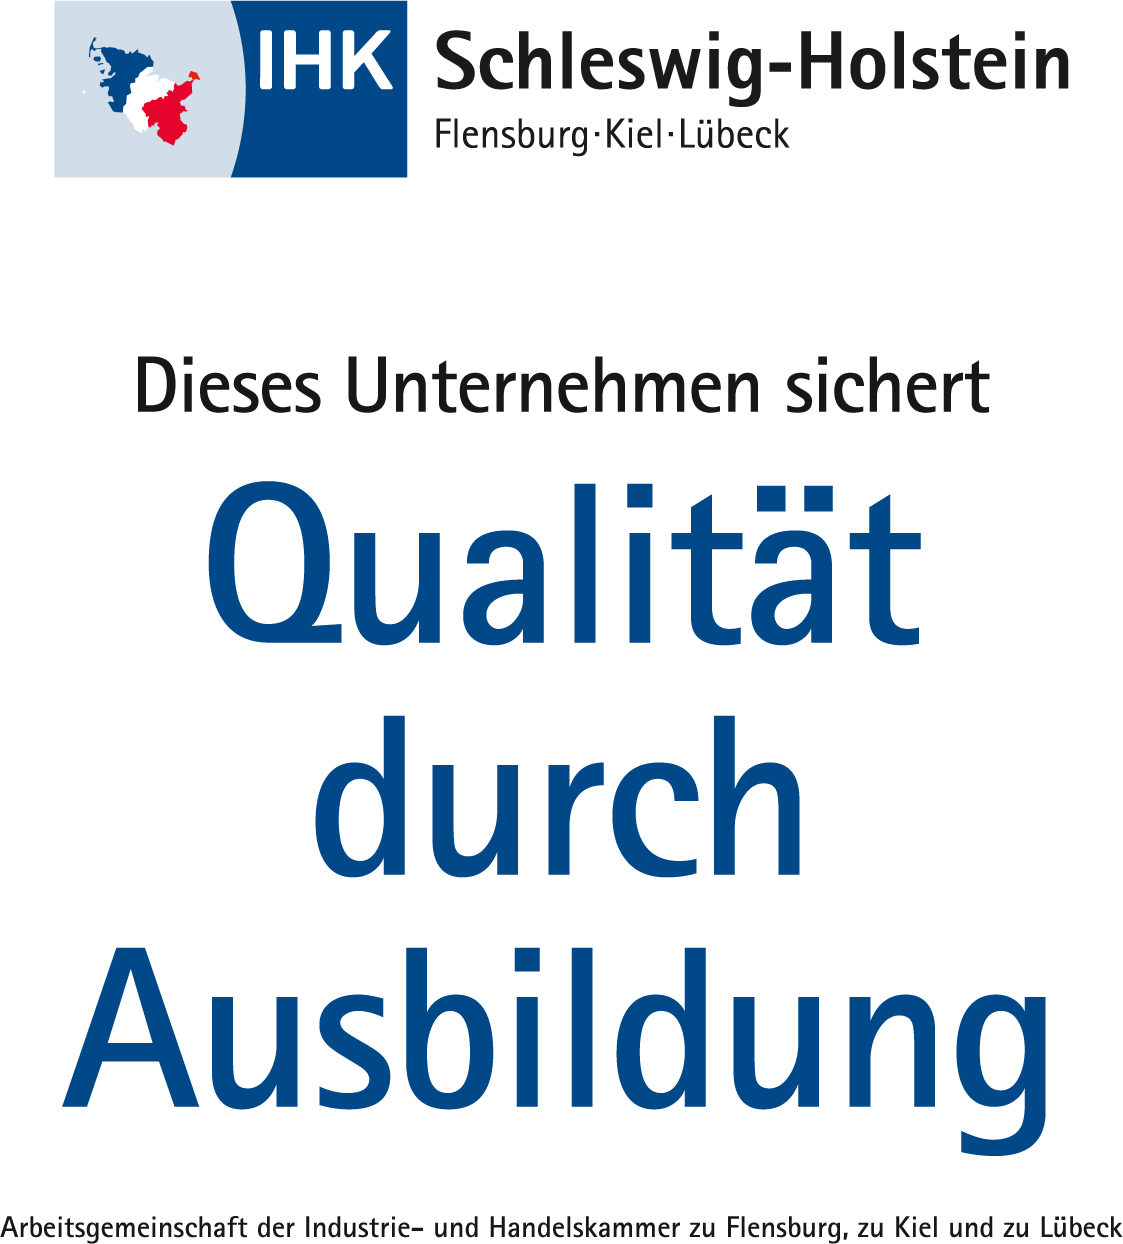 Wien Stellenangebote